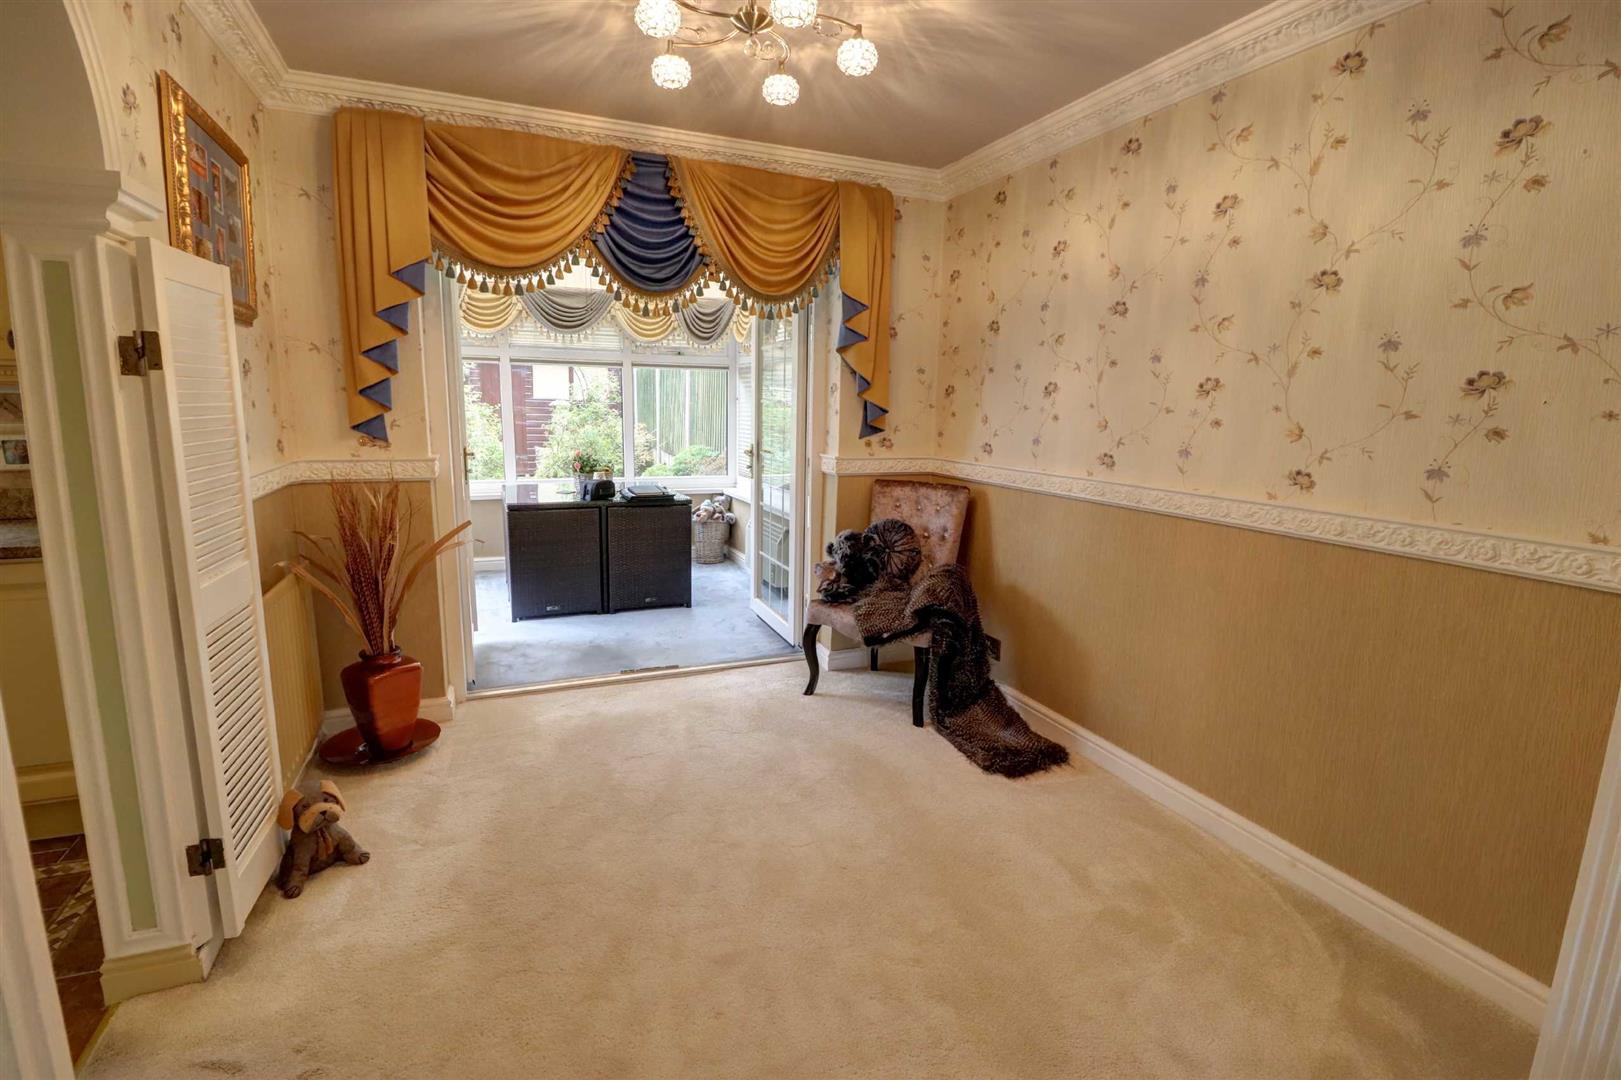 3 Bedroom Detached House For Sale - Image 6